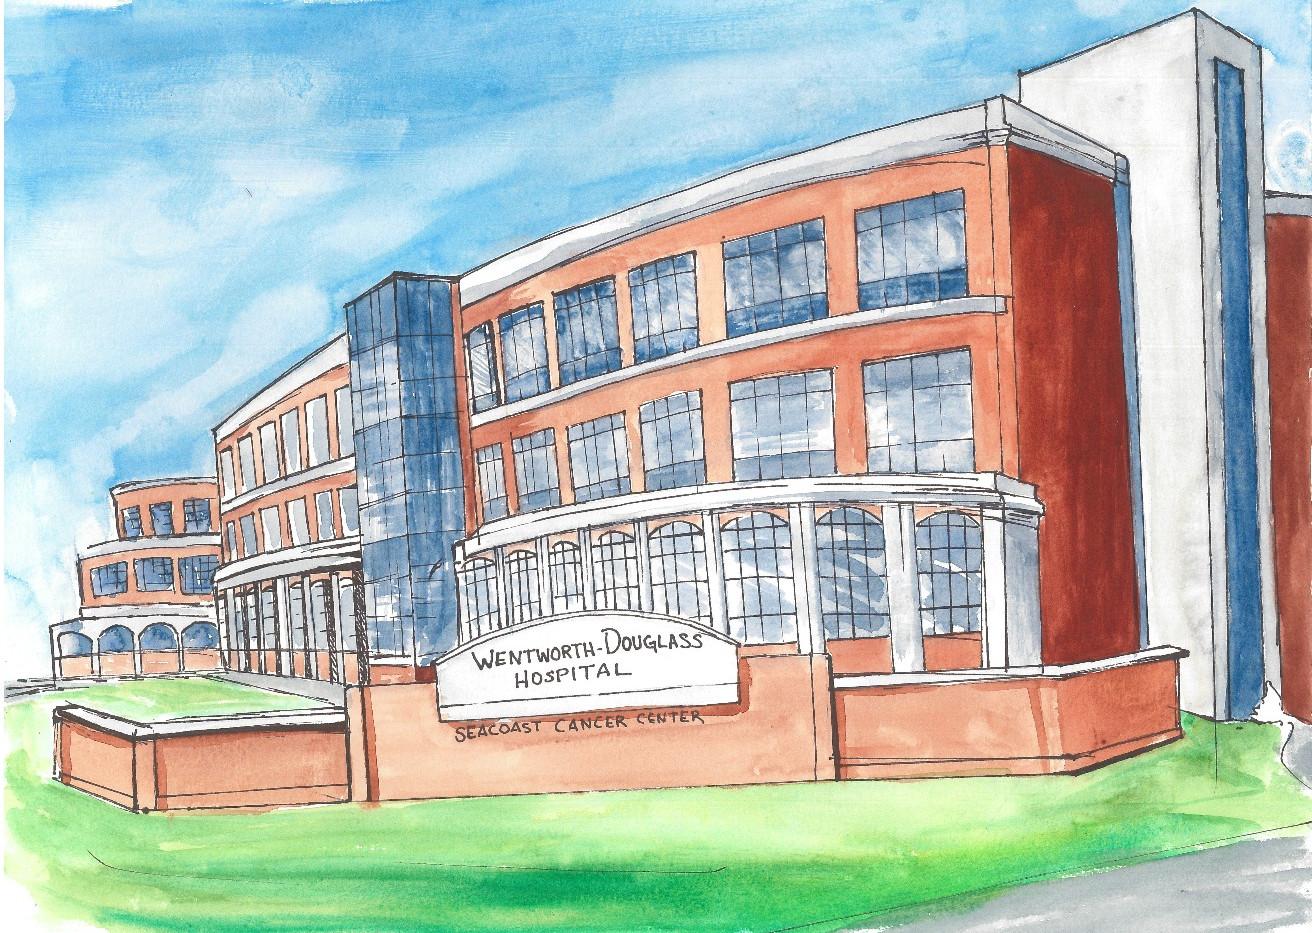 Wentworth-Douglass Hospital